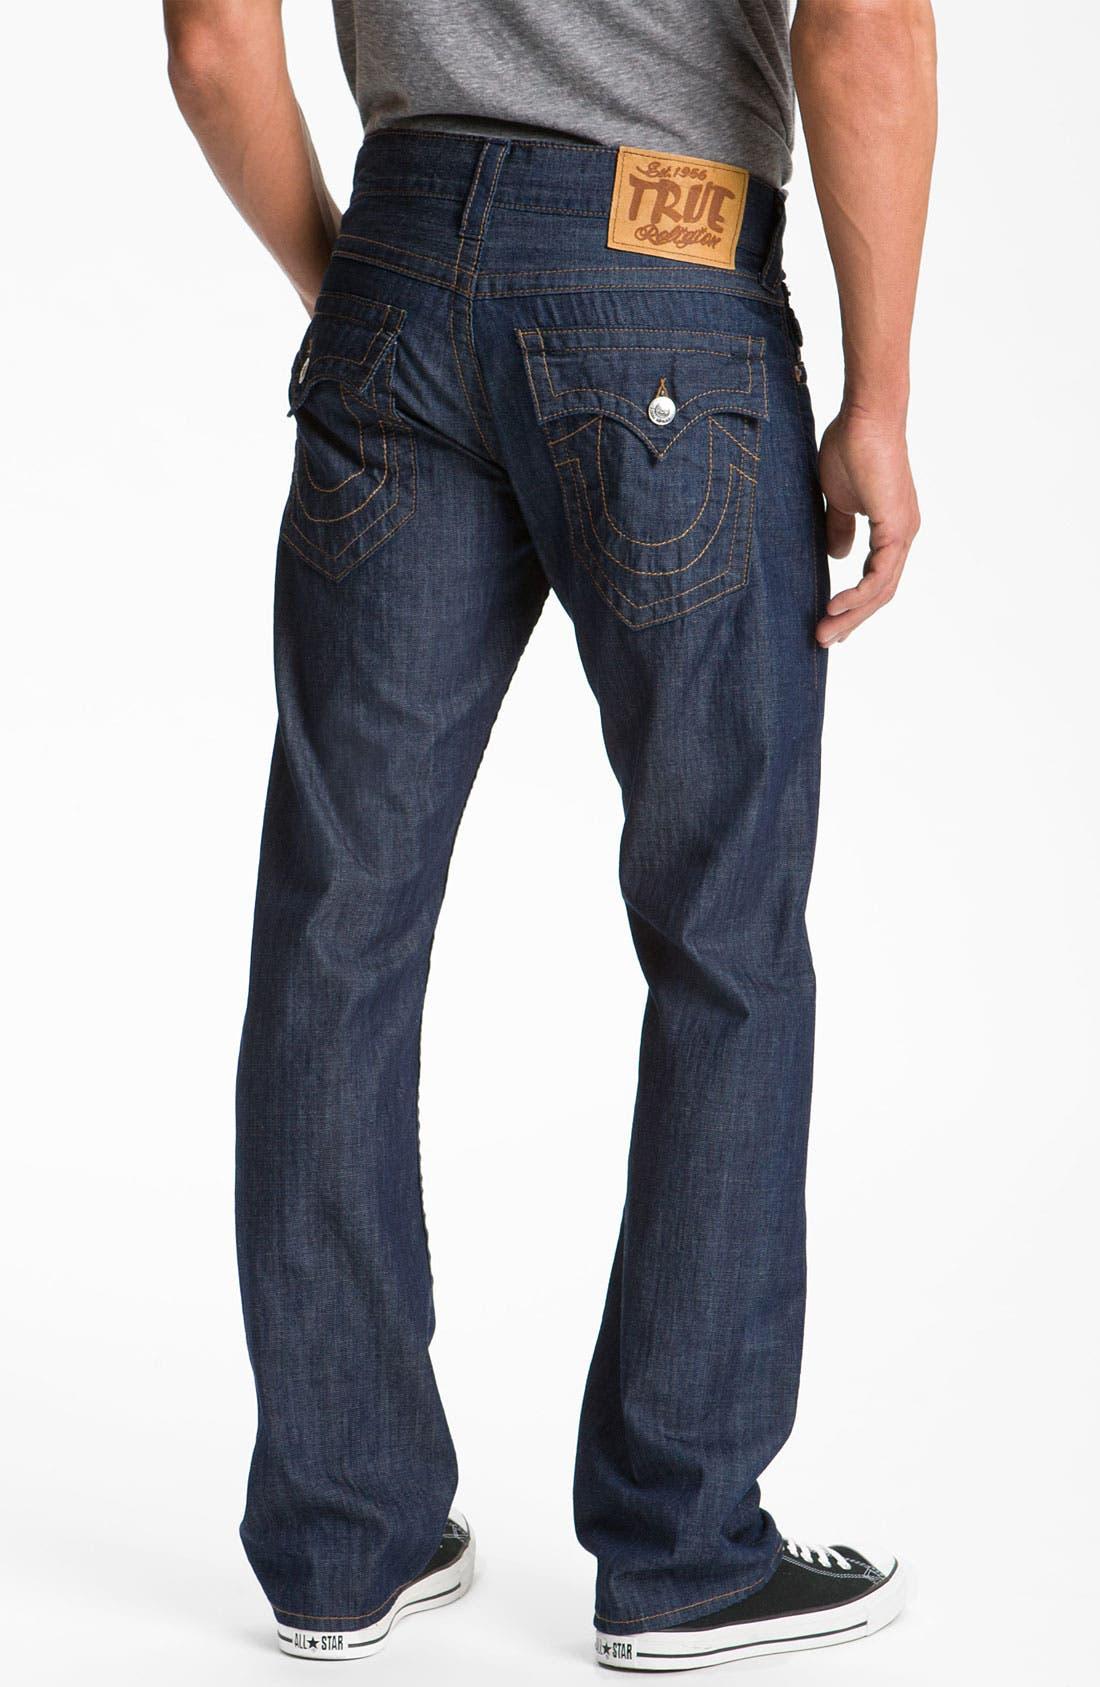 Main Image - True Religion Brand Jeans 'Ricky' Straight Leg Jeans (2S Bodyrinse)